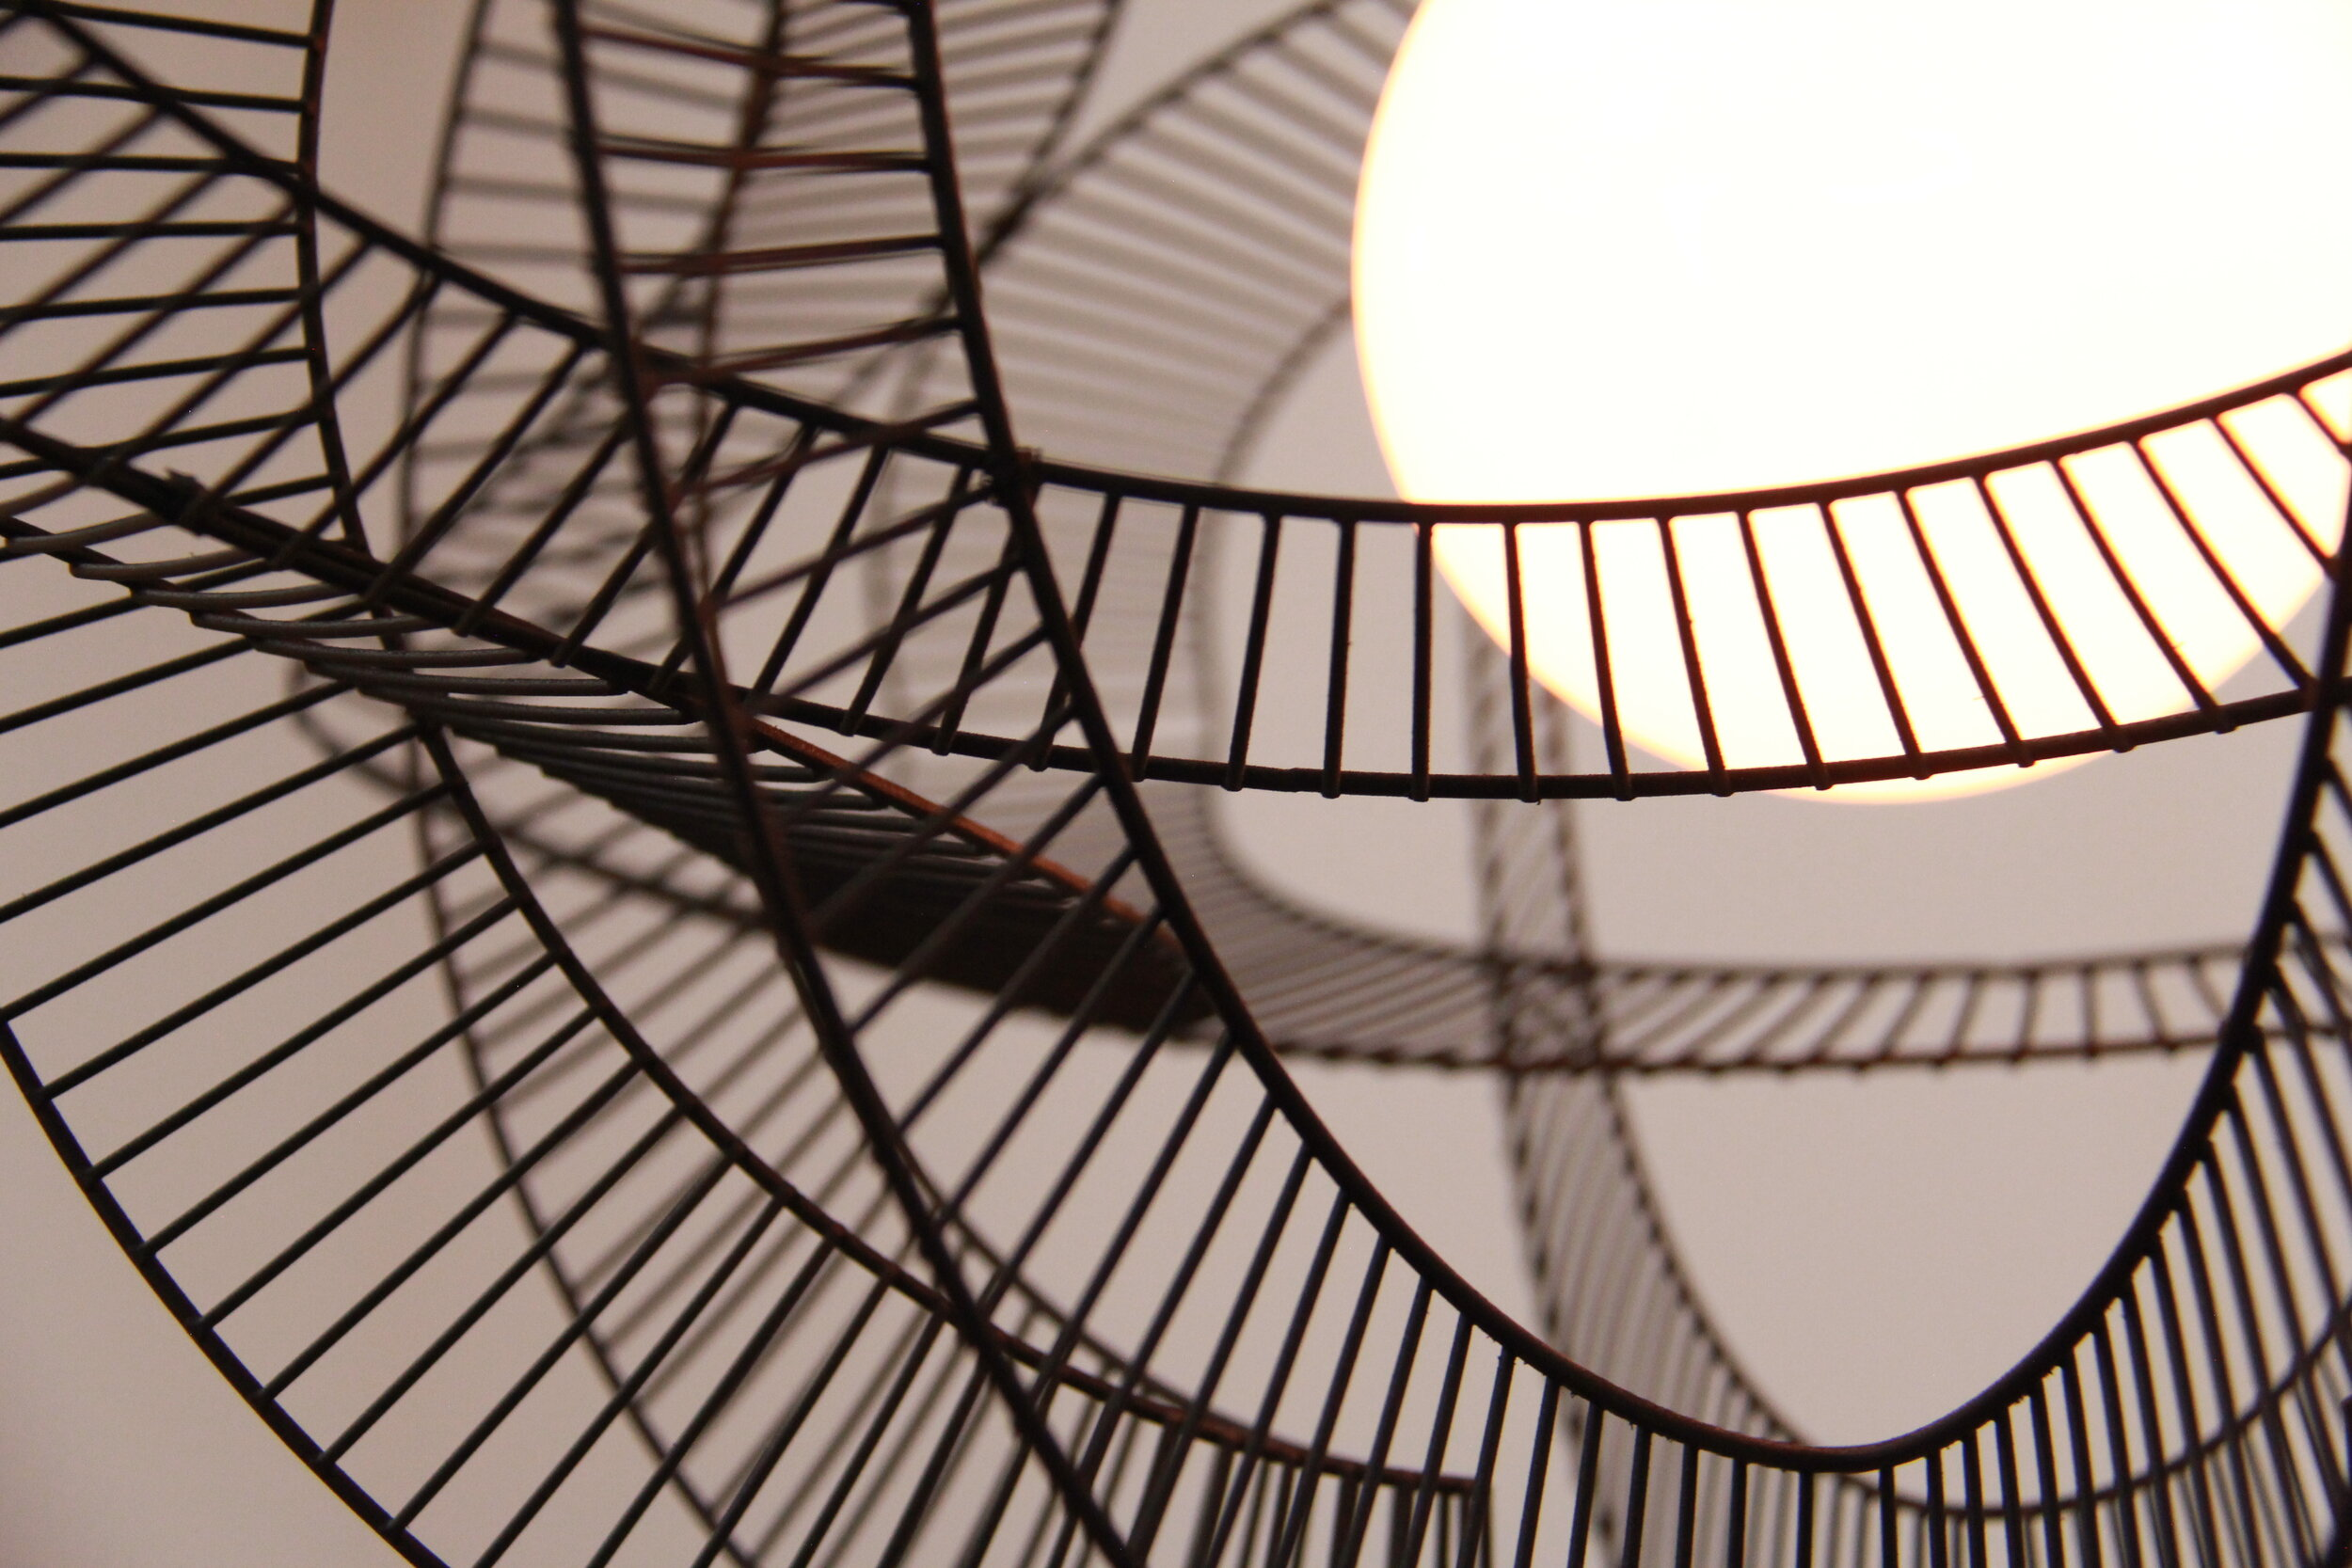 Olas_Sphera_black_brass_luminaire_design_lampe_lamp_studio-botte_pendant 6.JPG